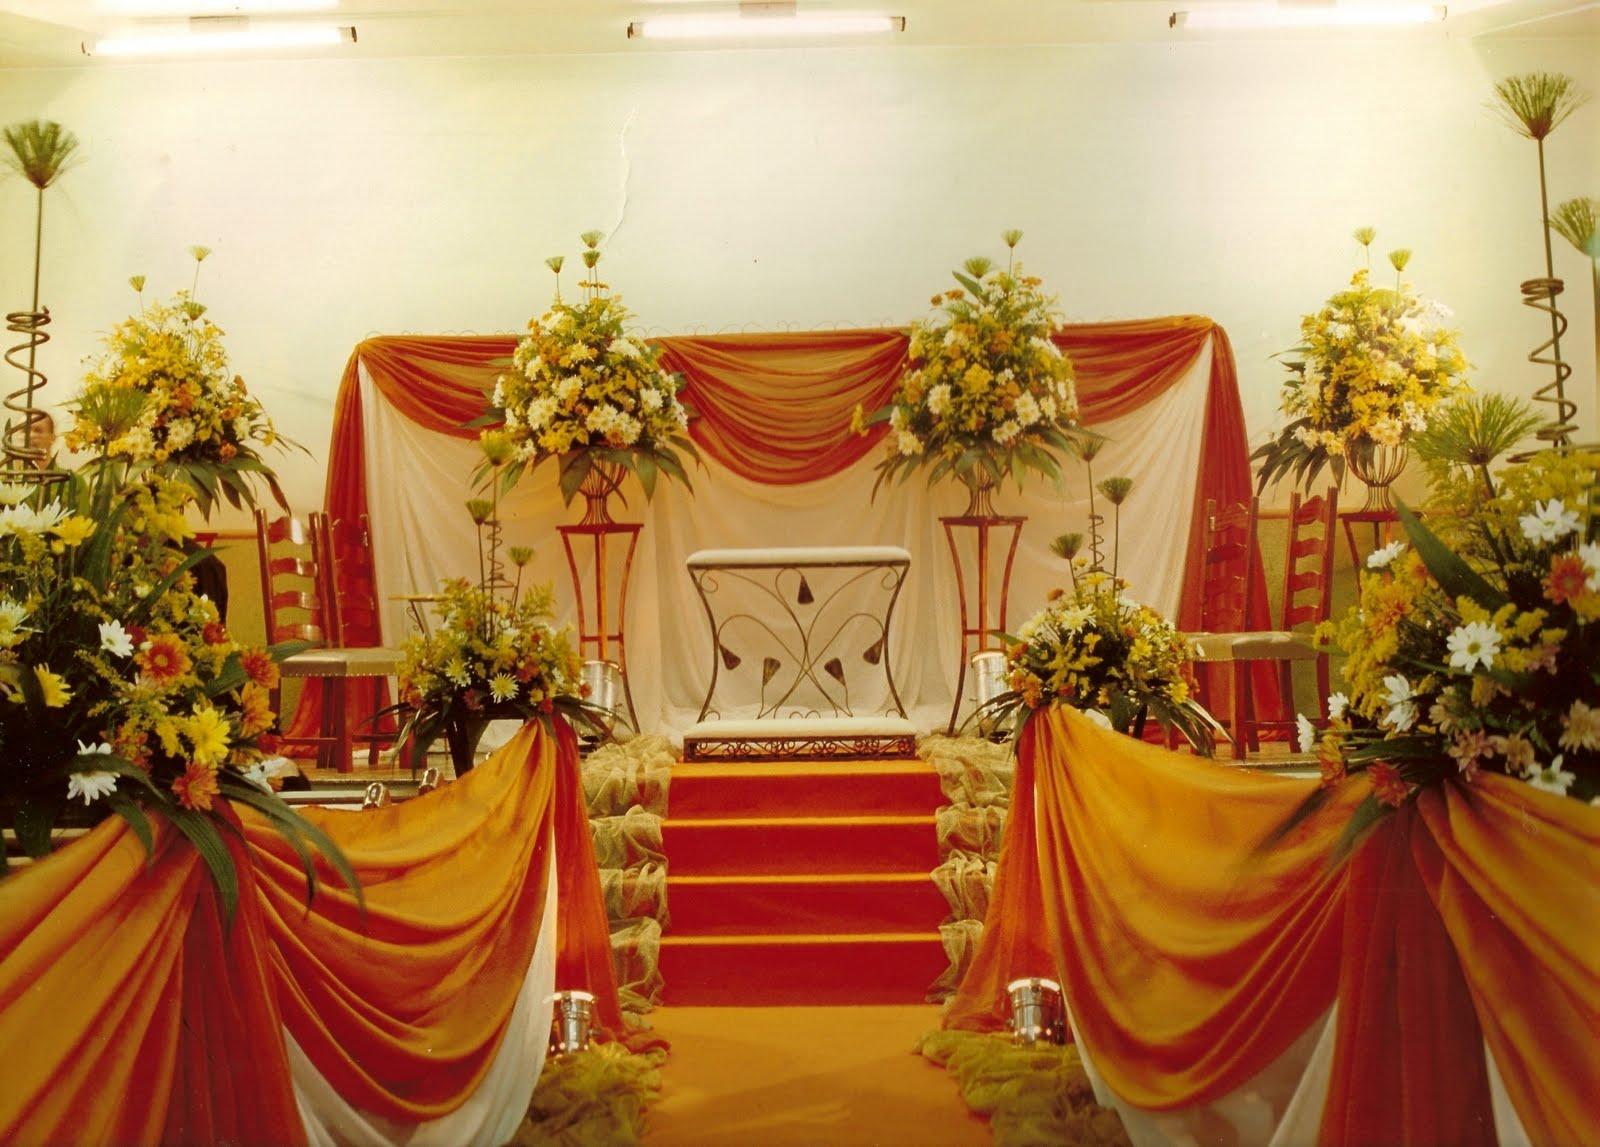 decoracao de casamento igreja evangelica : decoracao de casamento igreja evangelica:Decoracao Para Igreja Evangelica